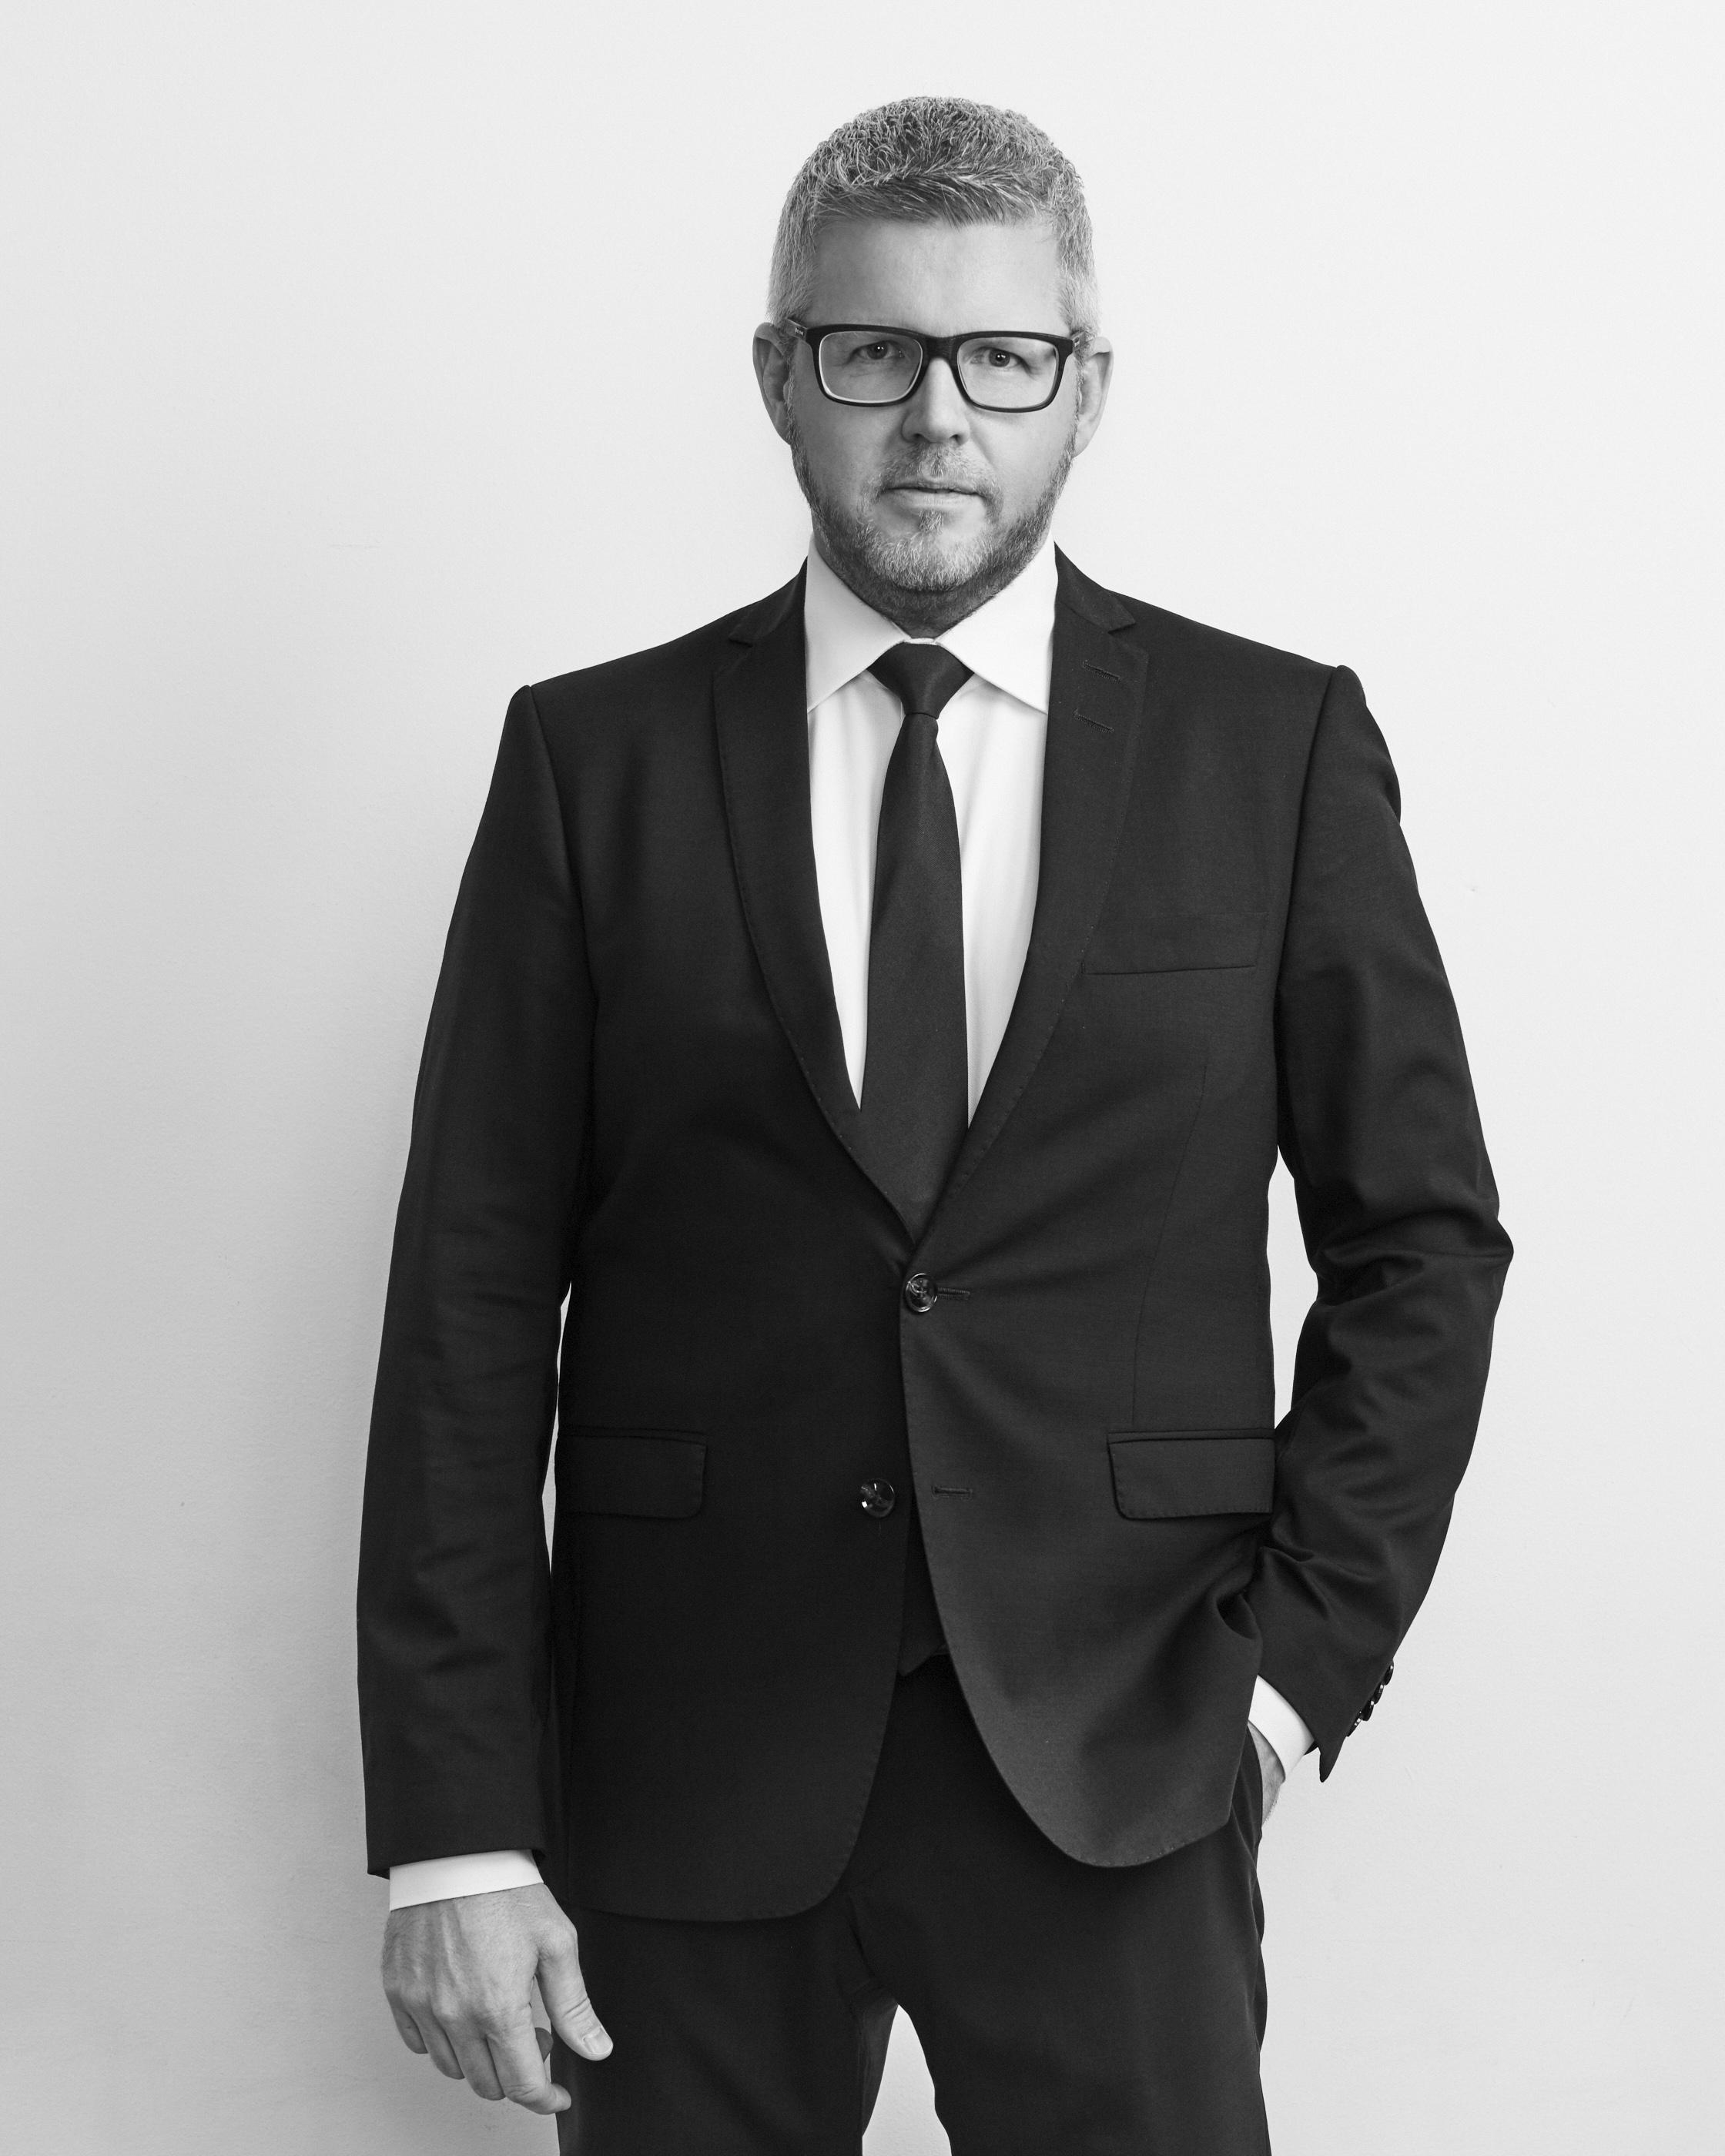 Nils Westerberg